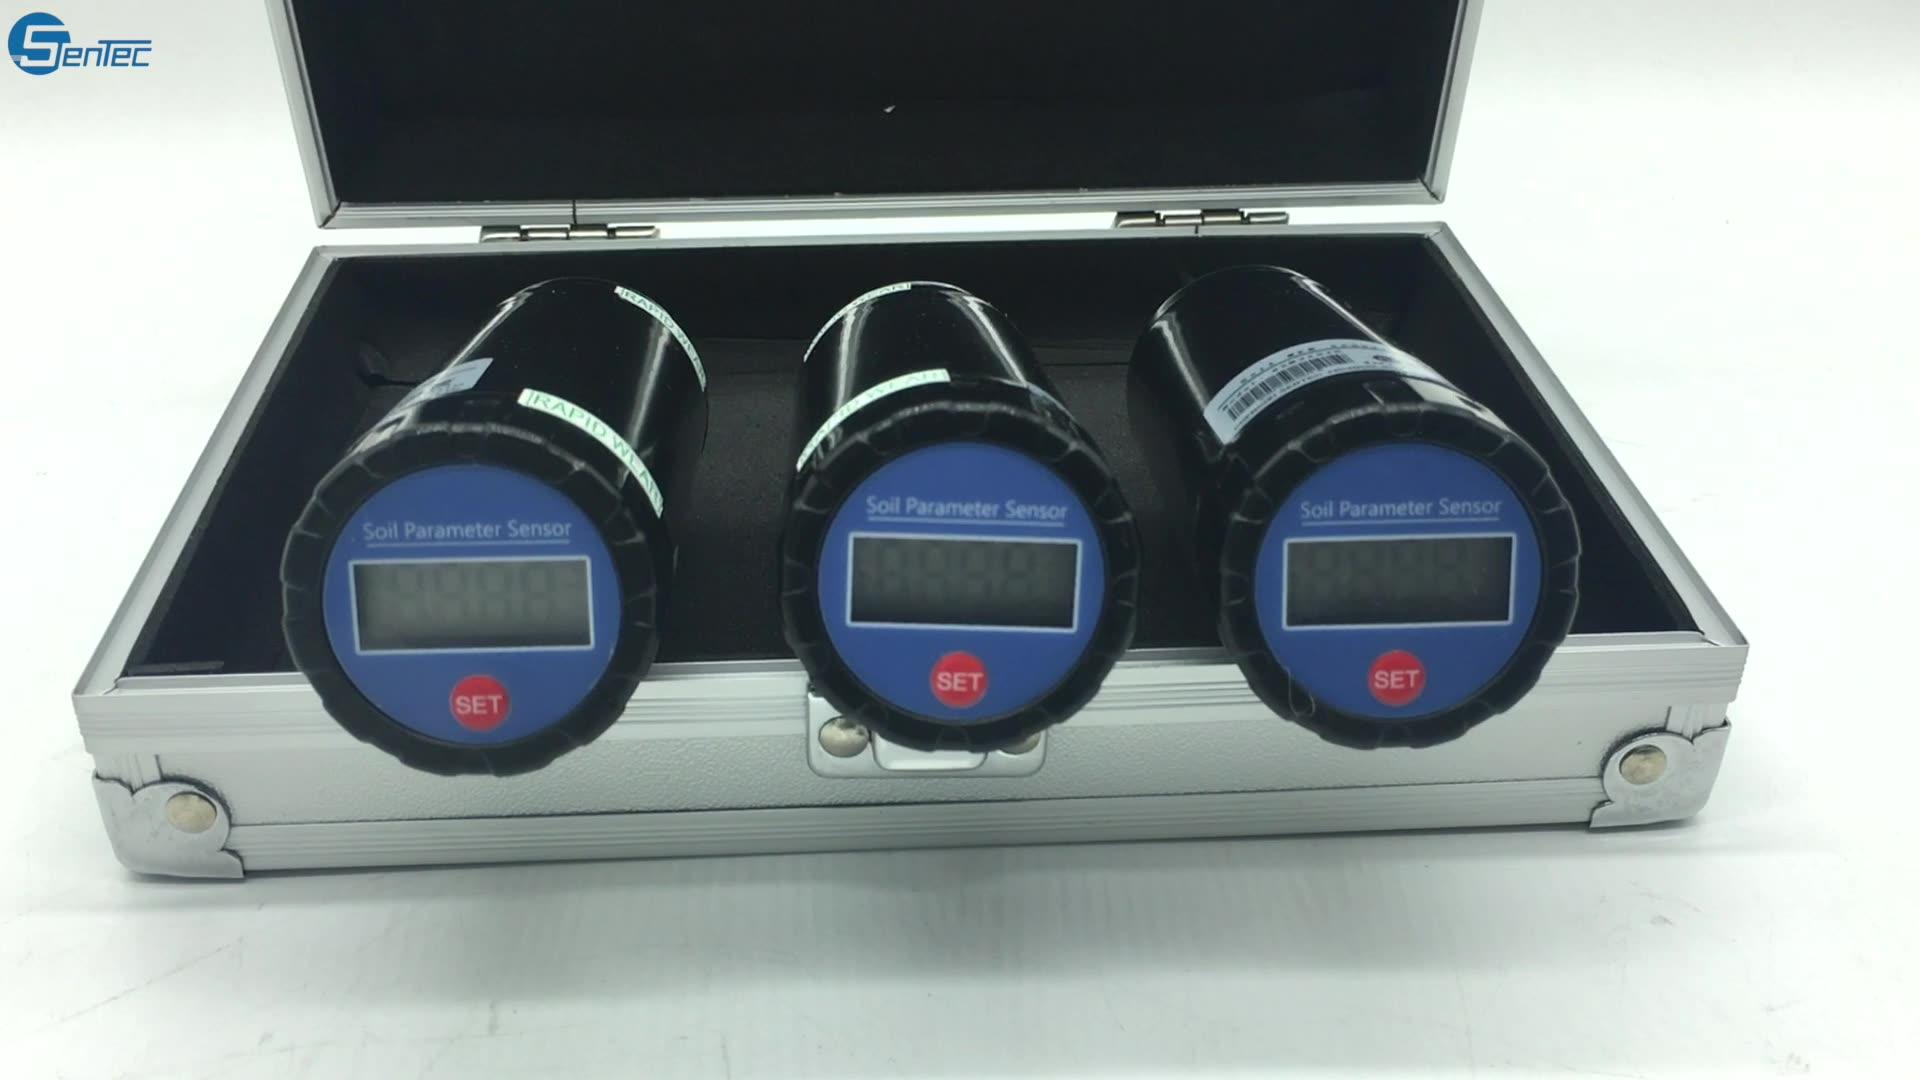 Intelligent LCD Display Digital 1 And 3 Way Probe Soil EC Nutrient Salinity NPK Sensor